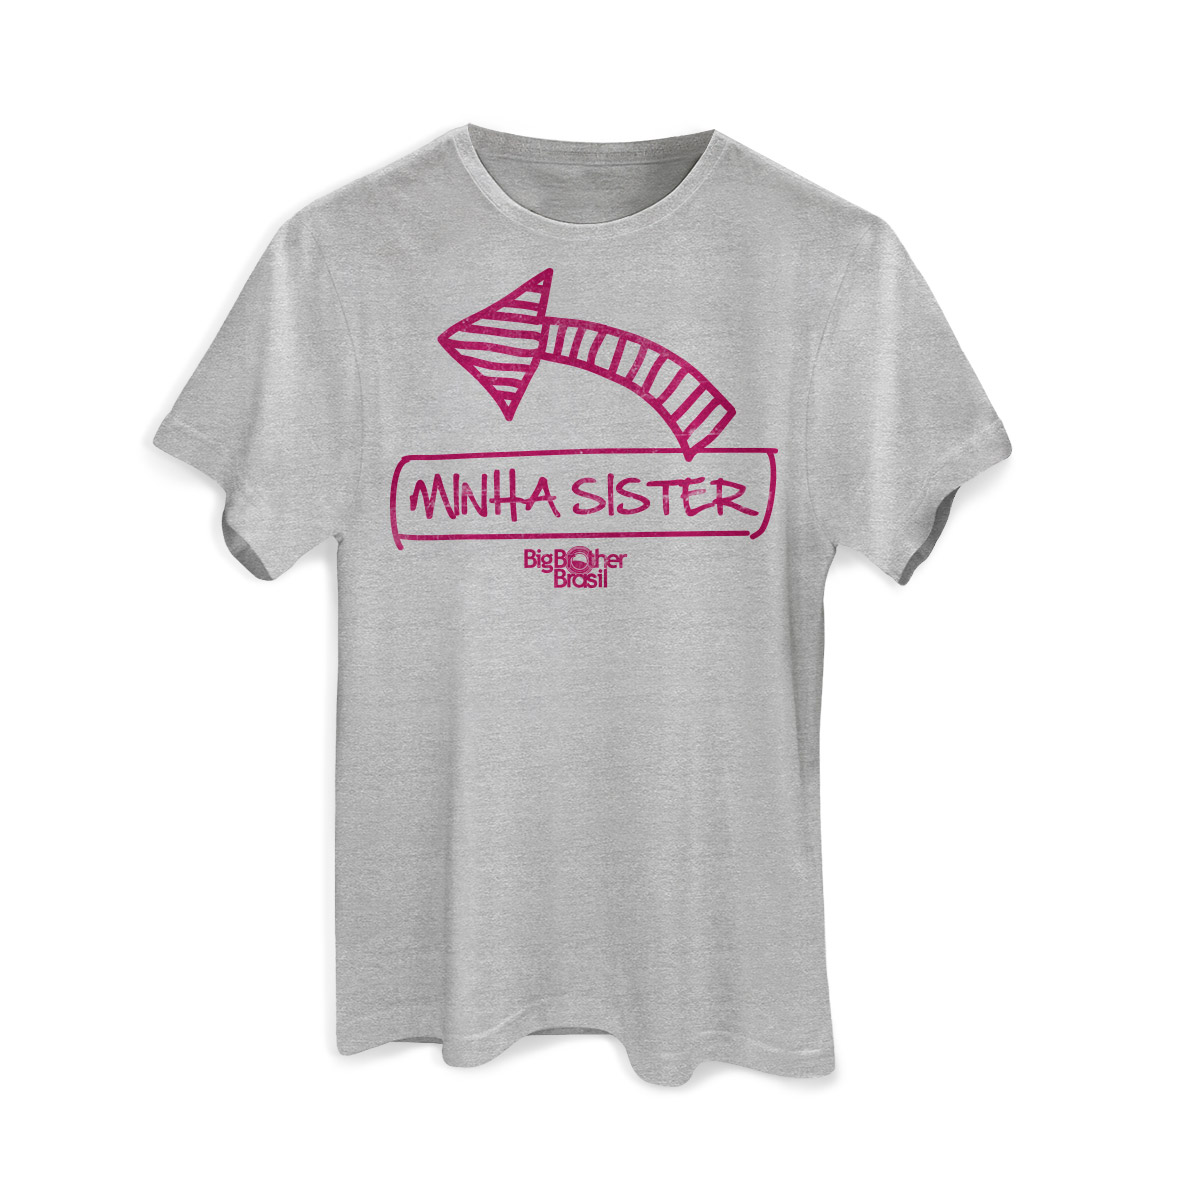 Camiseta Masculina Big Brother Brasil 15 Minha Sister Modelo 2